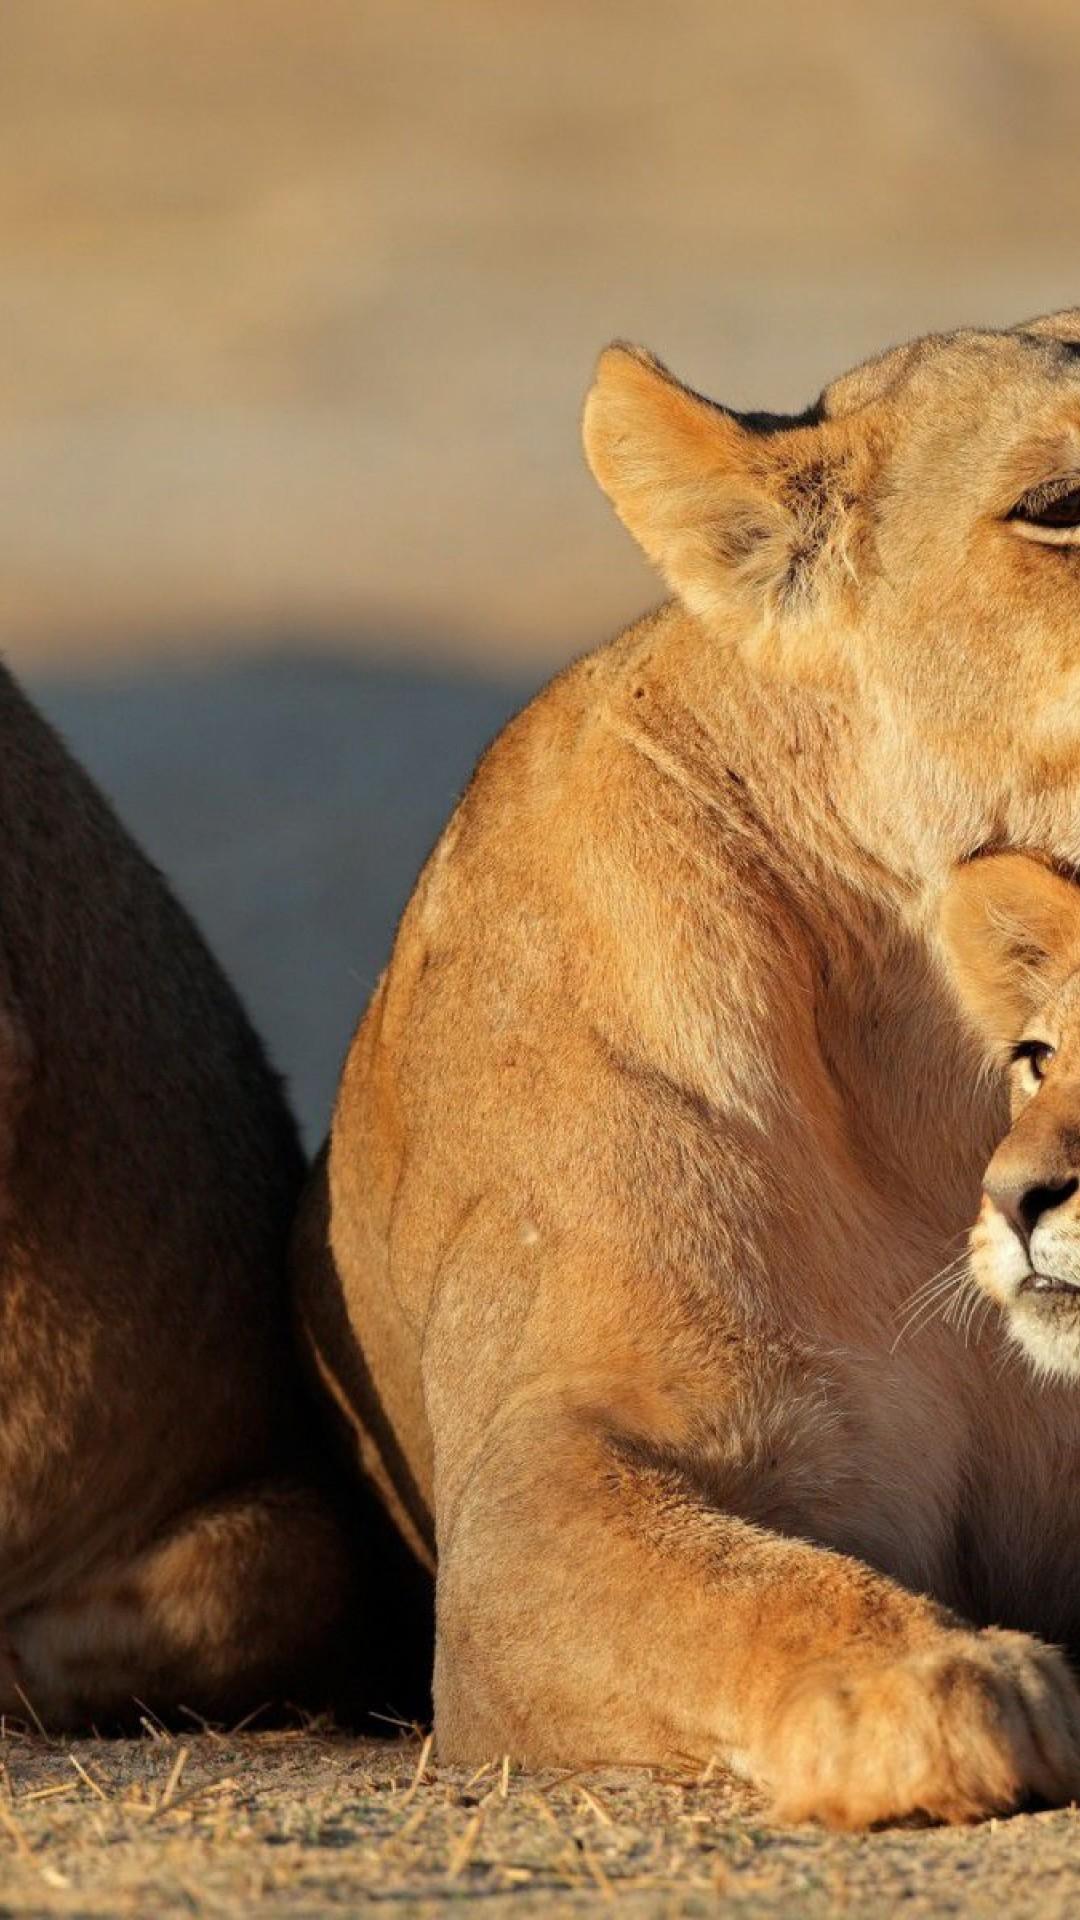 Wallpaper 750×1334 Cub Baby Kids Lion Iphone 6 Hd